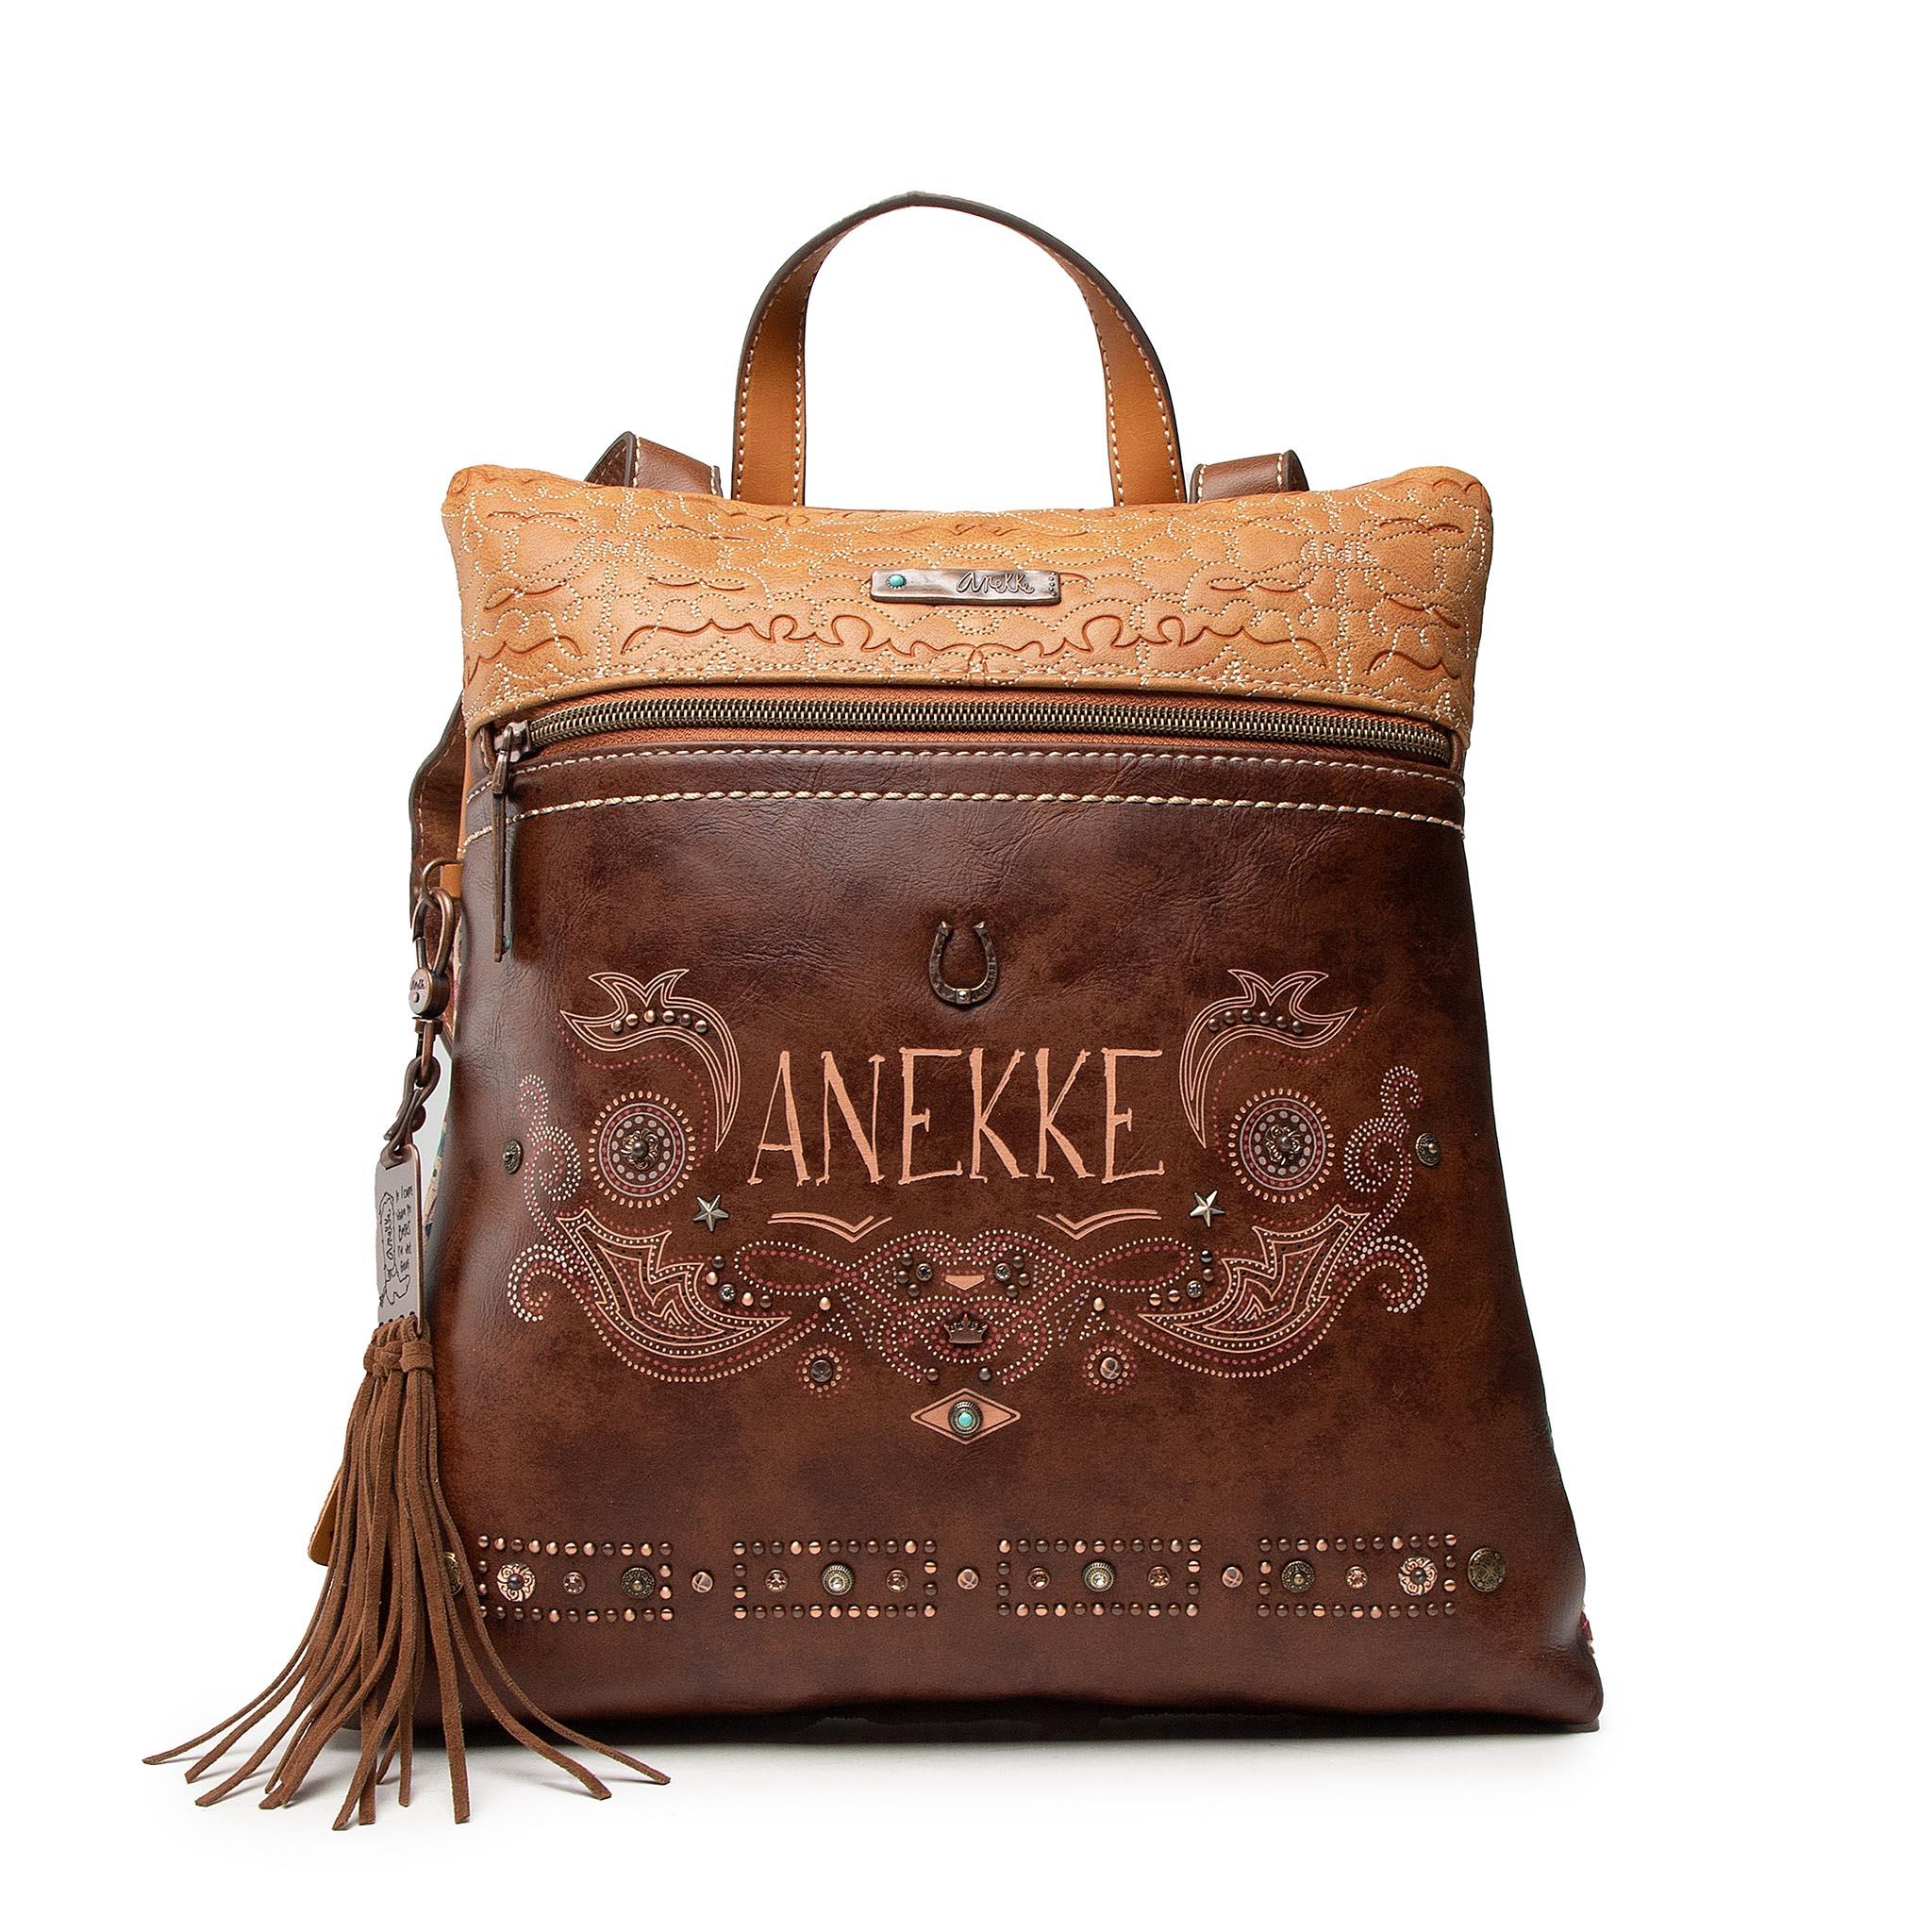 Image of Rucksack ANEKKE - AN30705-31ARS Braun